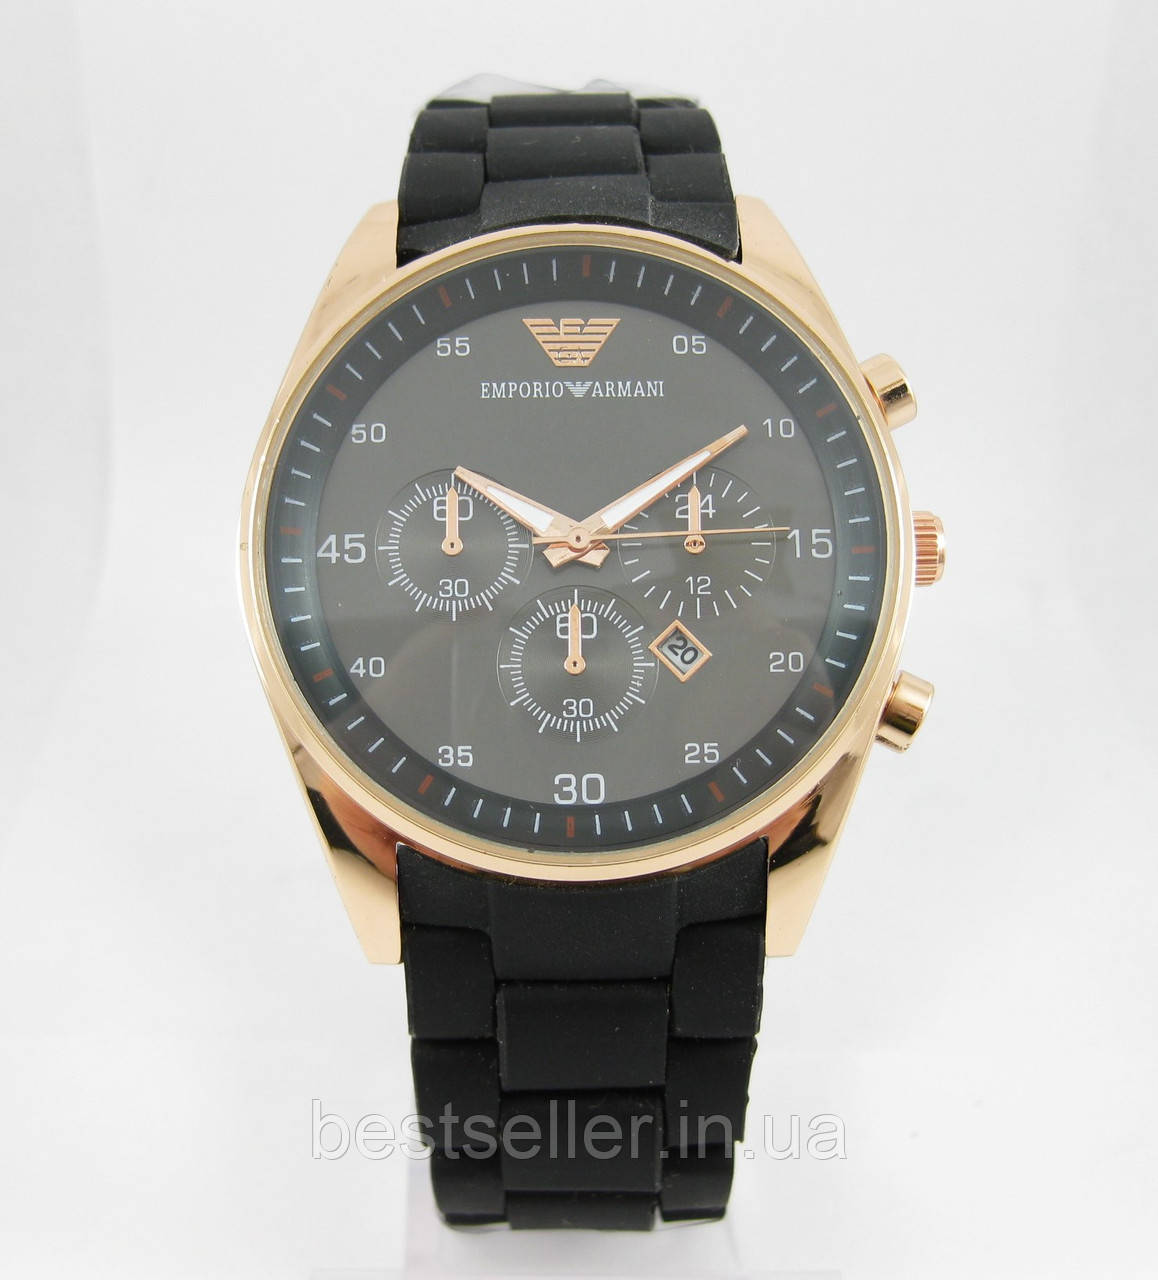 9d039046 Часы Emporio Armani Silicone gold/black (кварц). Реплика - Интернет-магазин